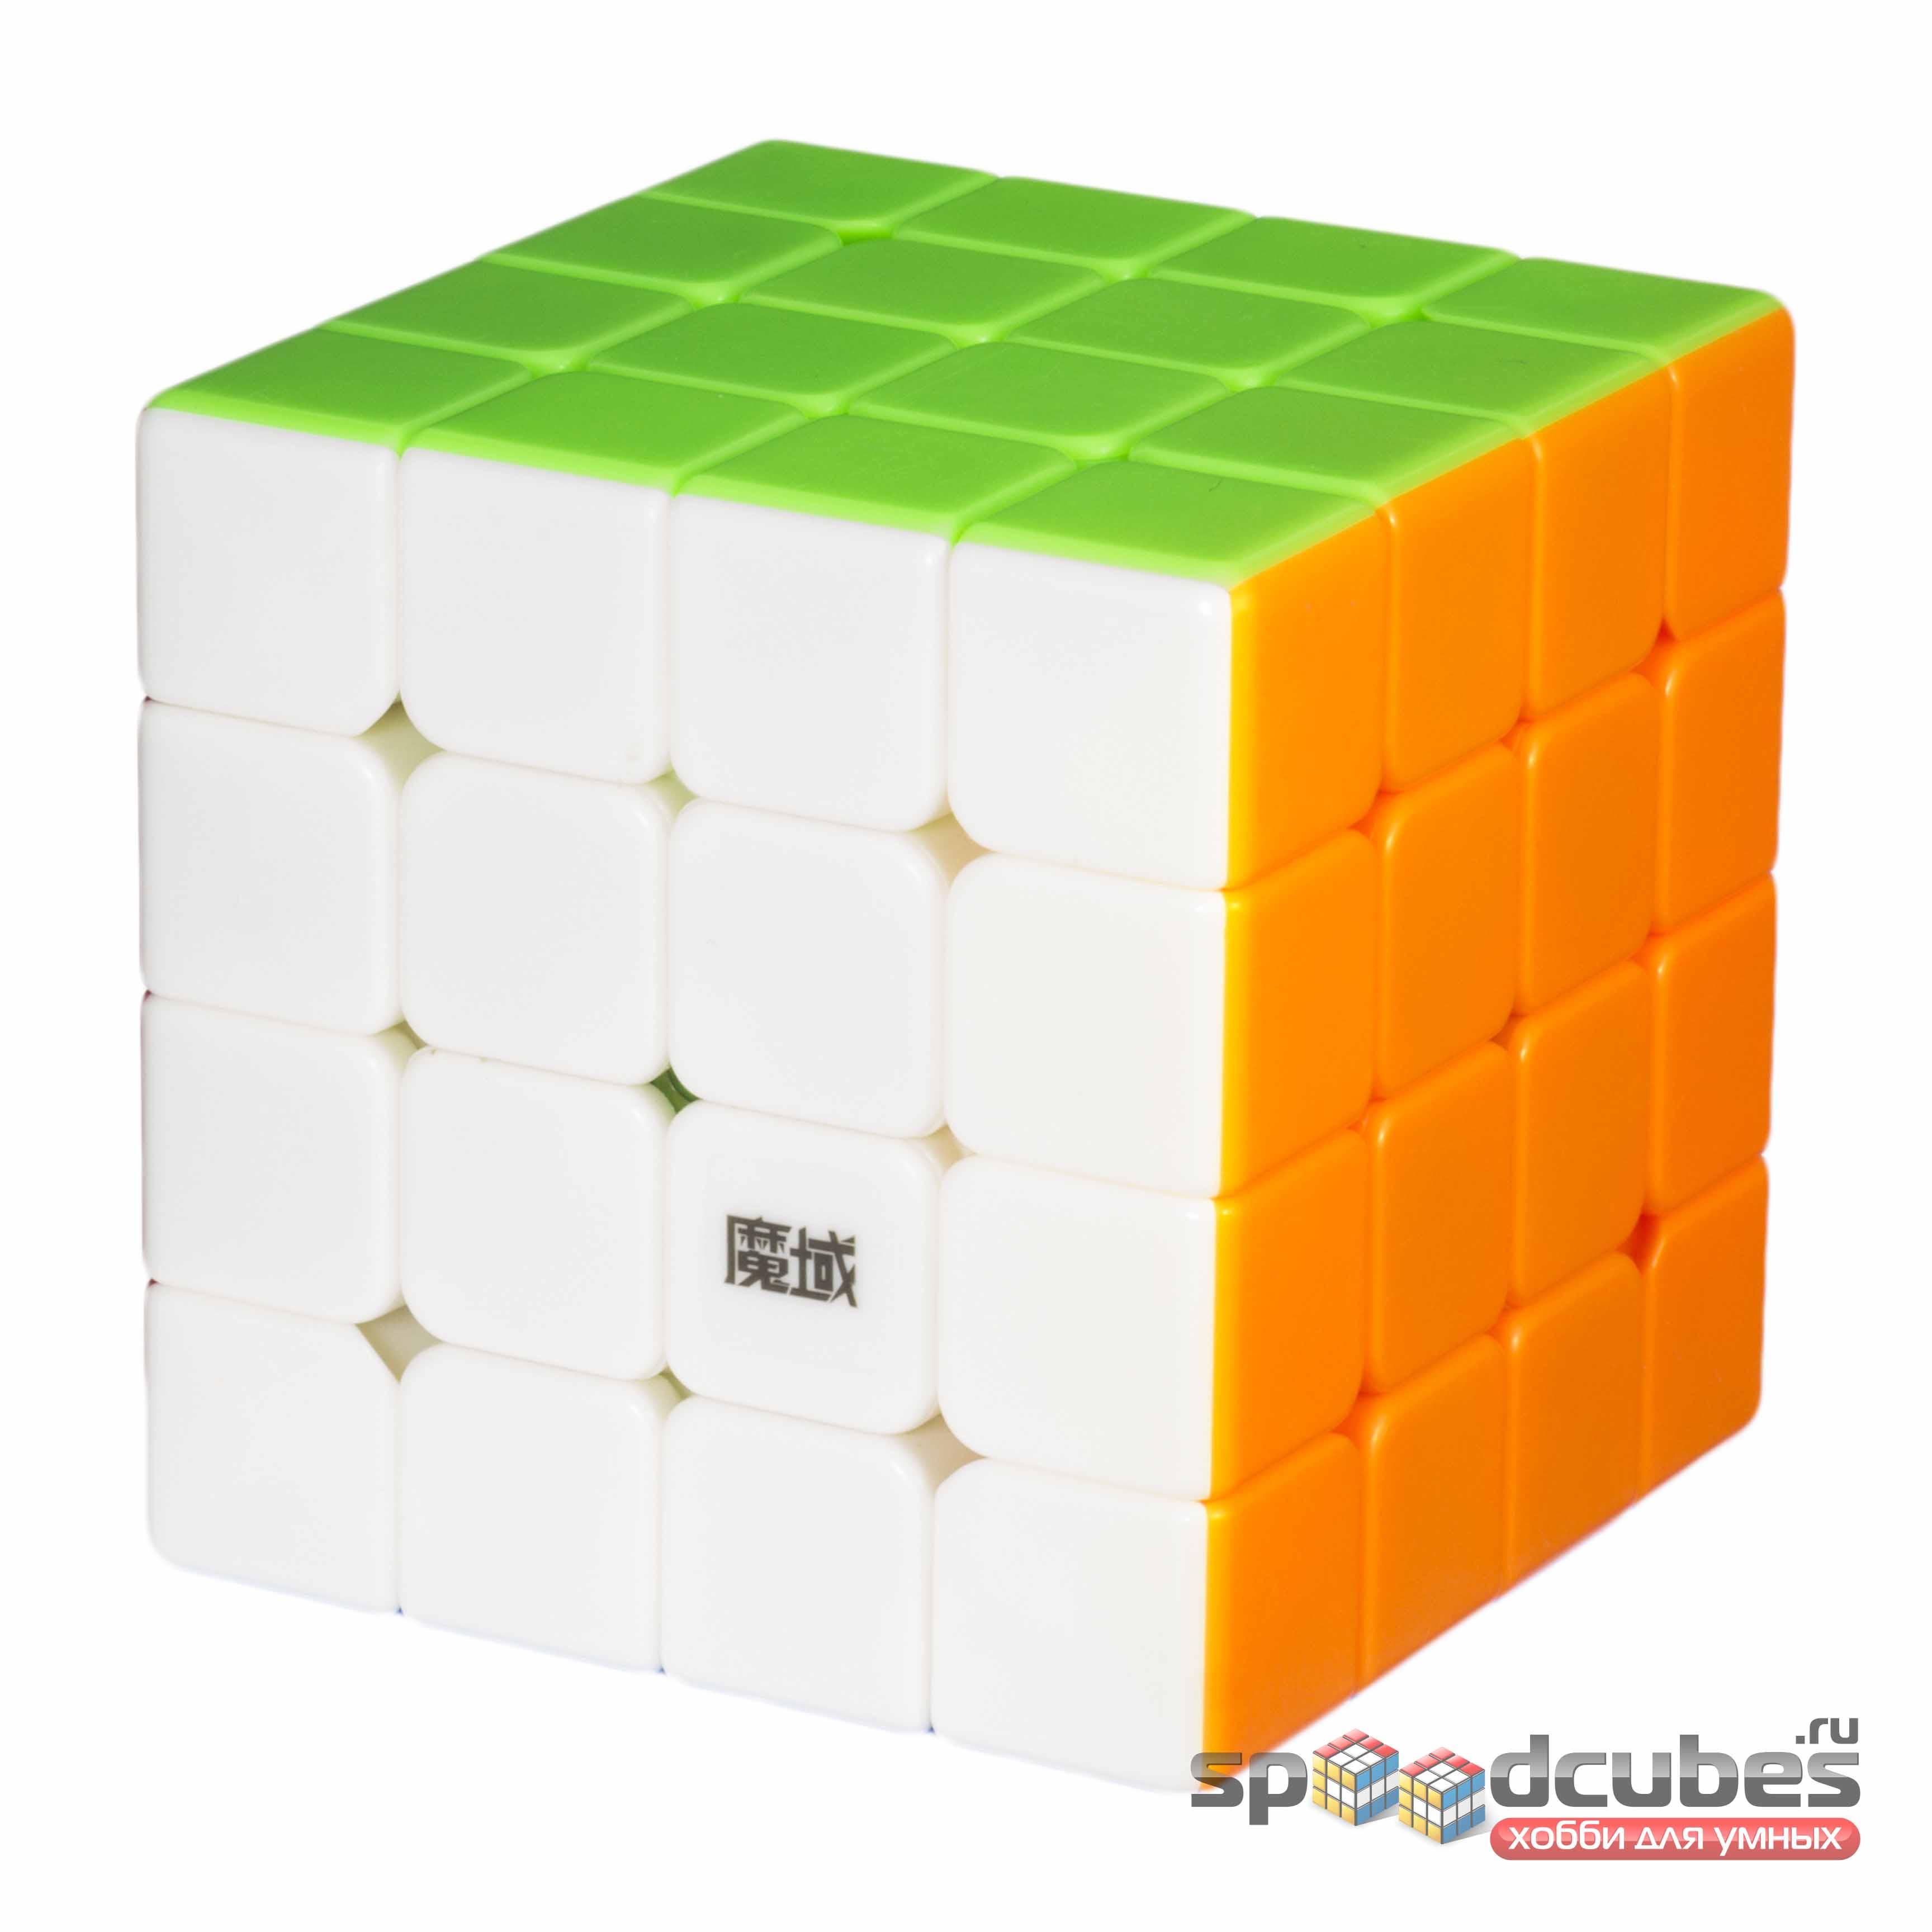 MoYu 4x4x4 Aosu GTS2 Color 2